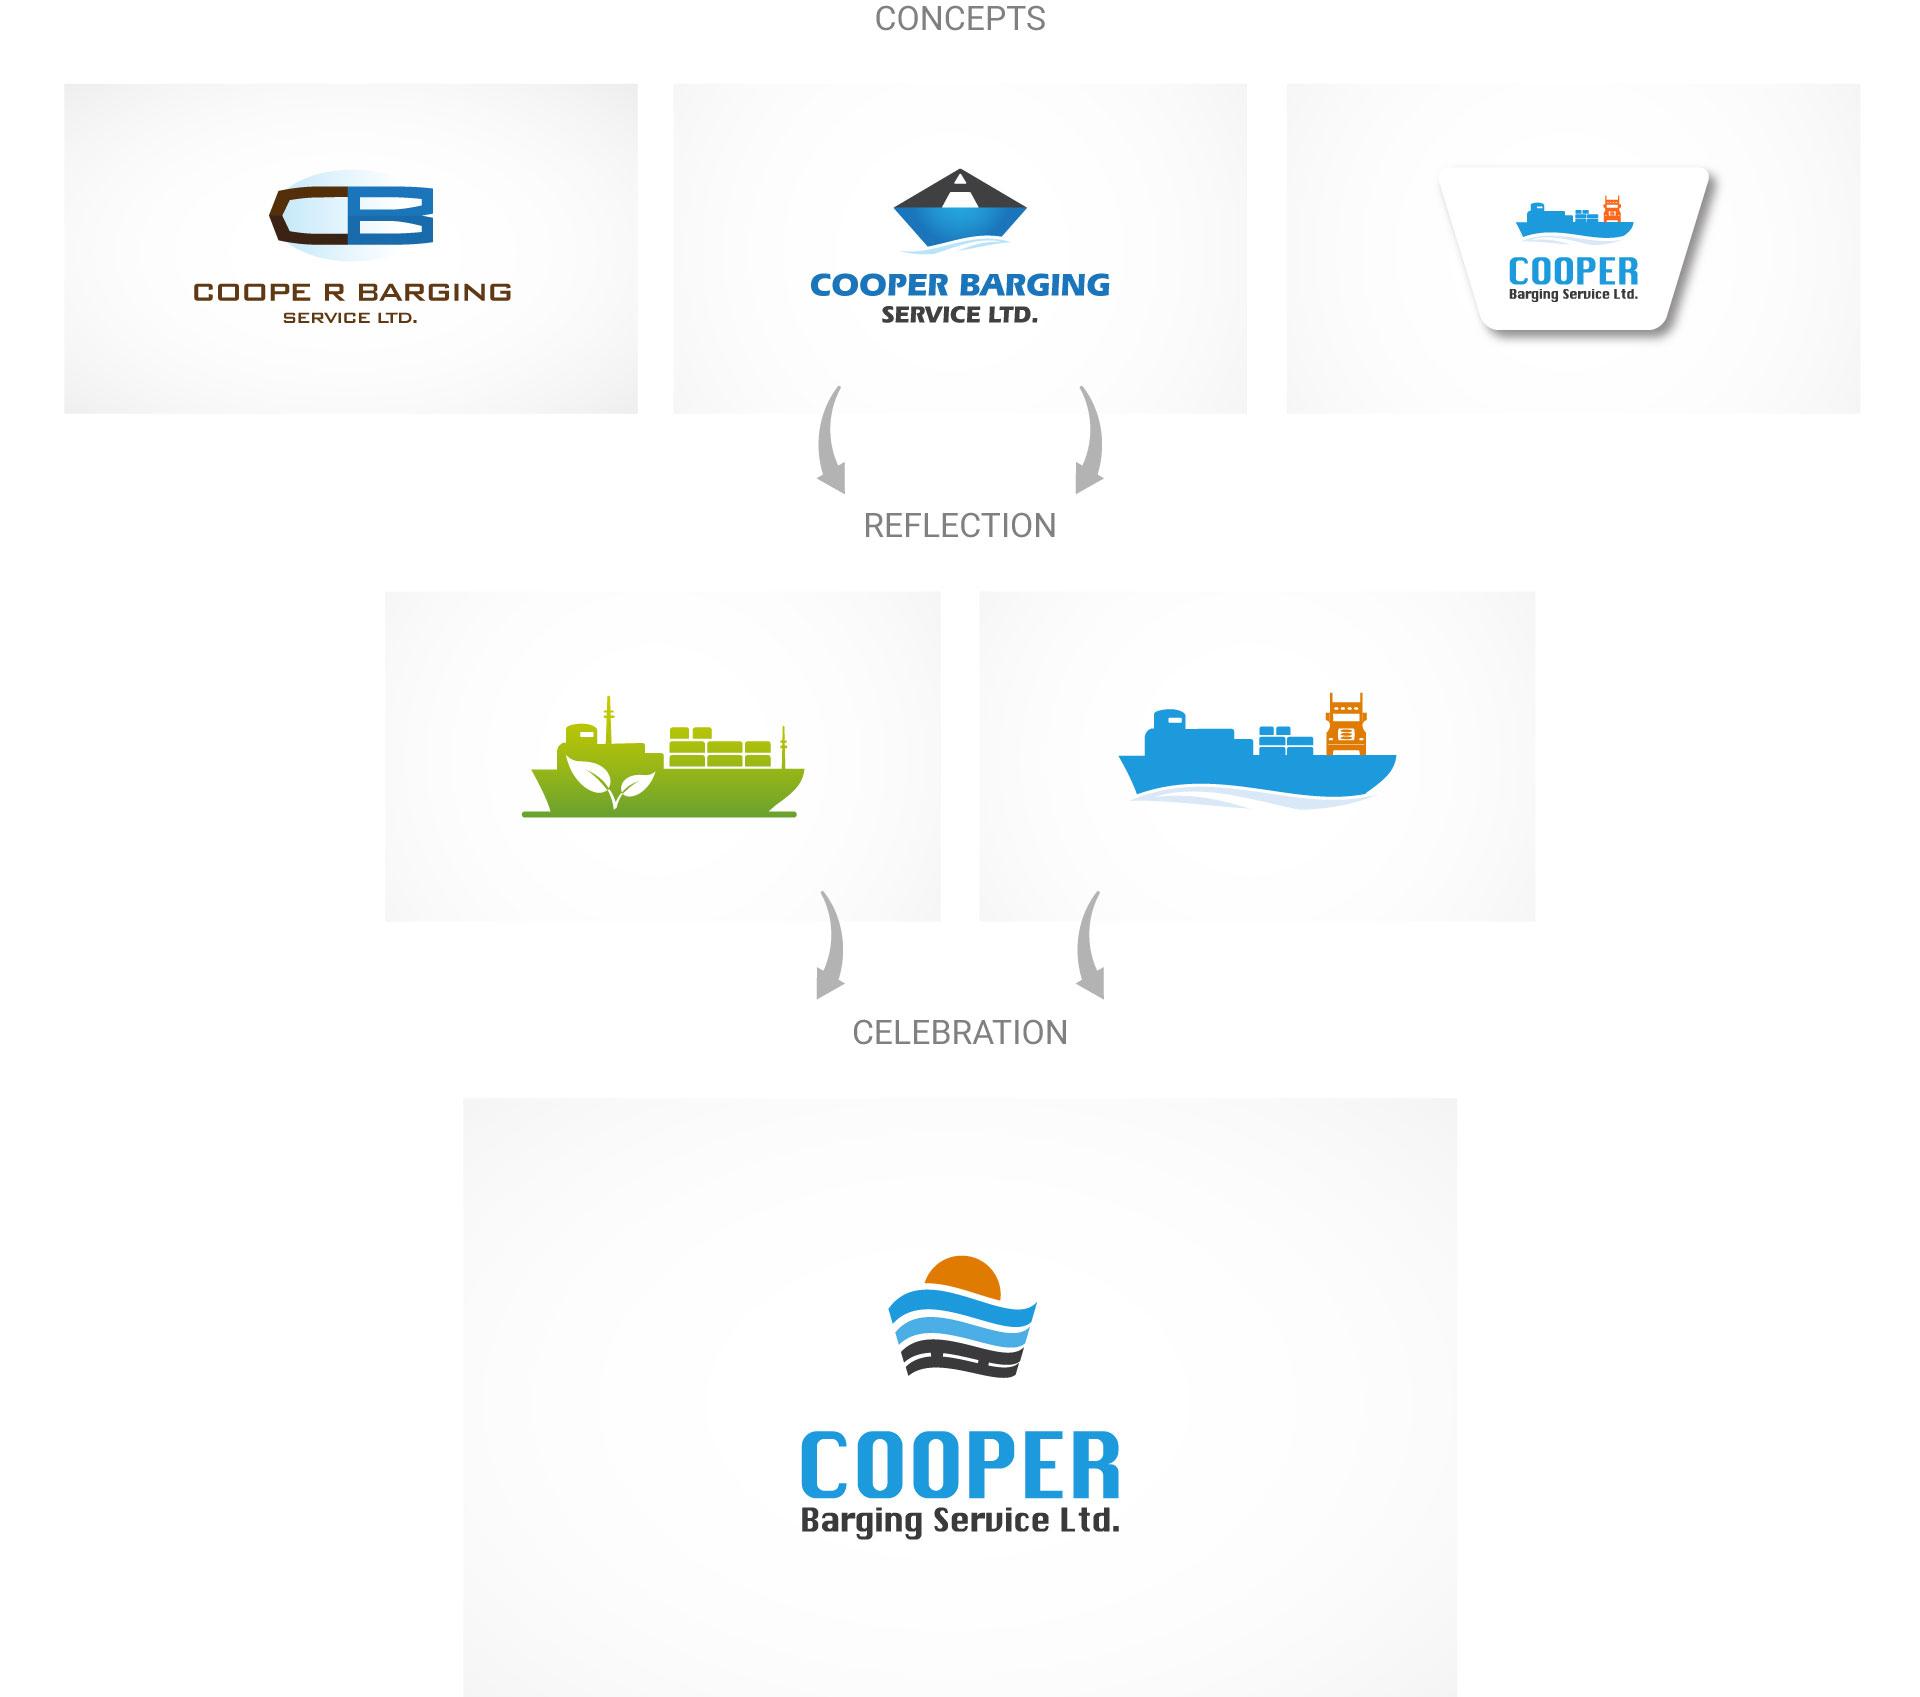 cooper-barging-service-logo-design-process-by-mapleweb-vancouver-canada